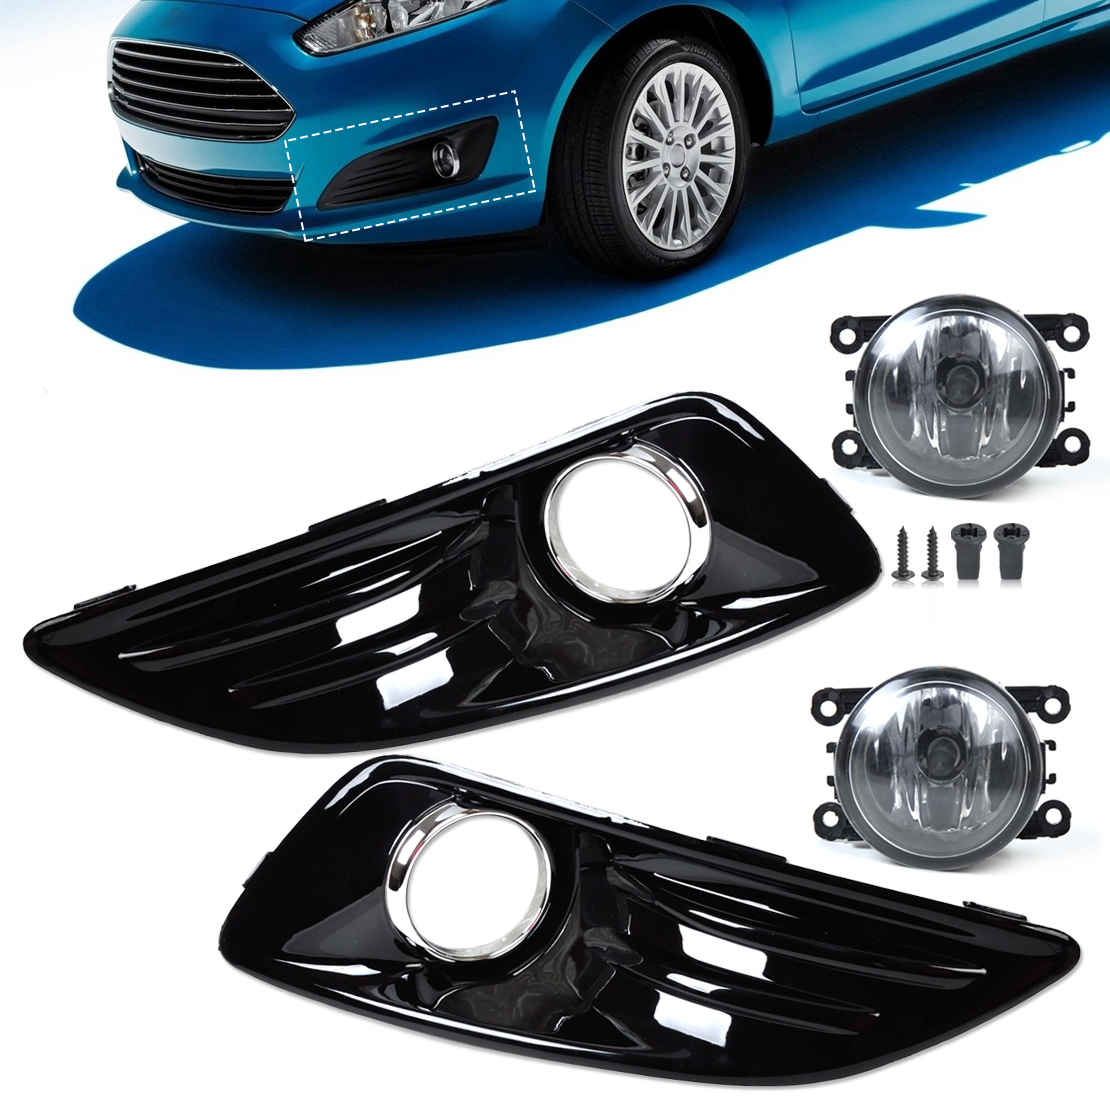 exLED 2x7 30W Single Row Spot LED Light Bar Driving Lamp LED Work Light IP67 Waterproof